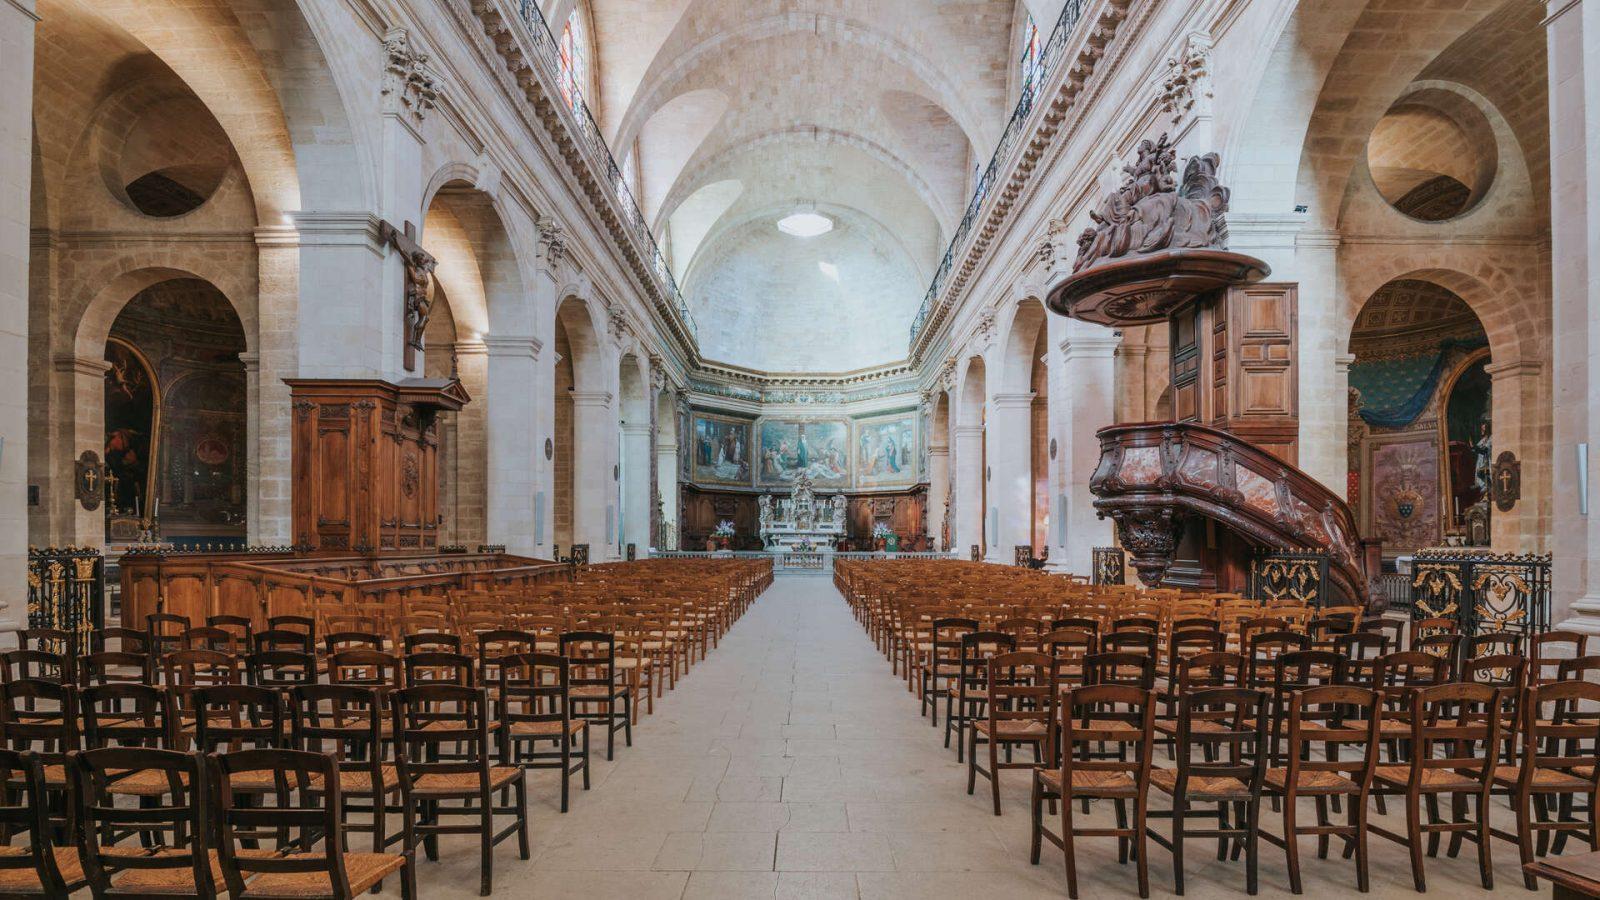 Eglise-Notre-Dame-Nicolas-Duffaure-2